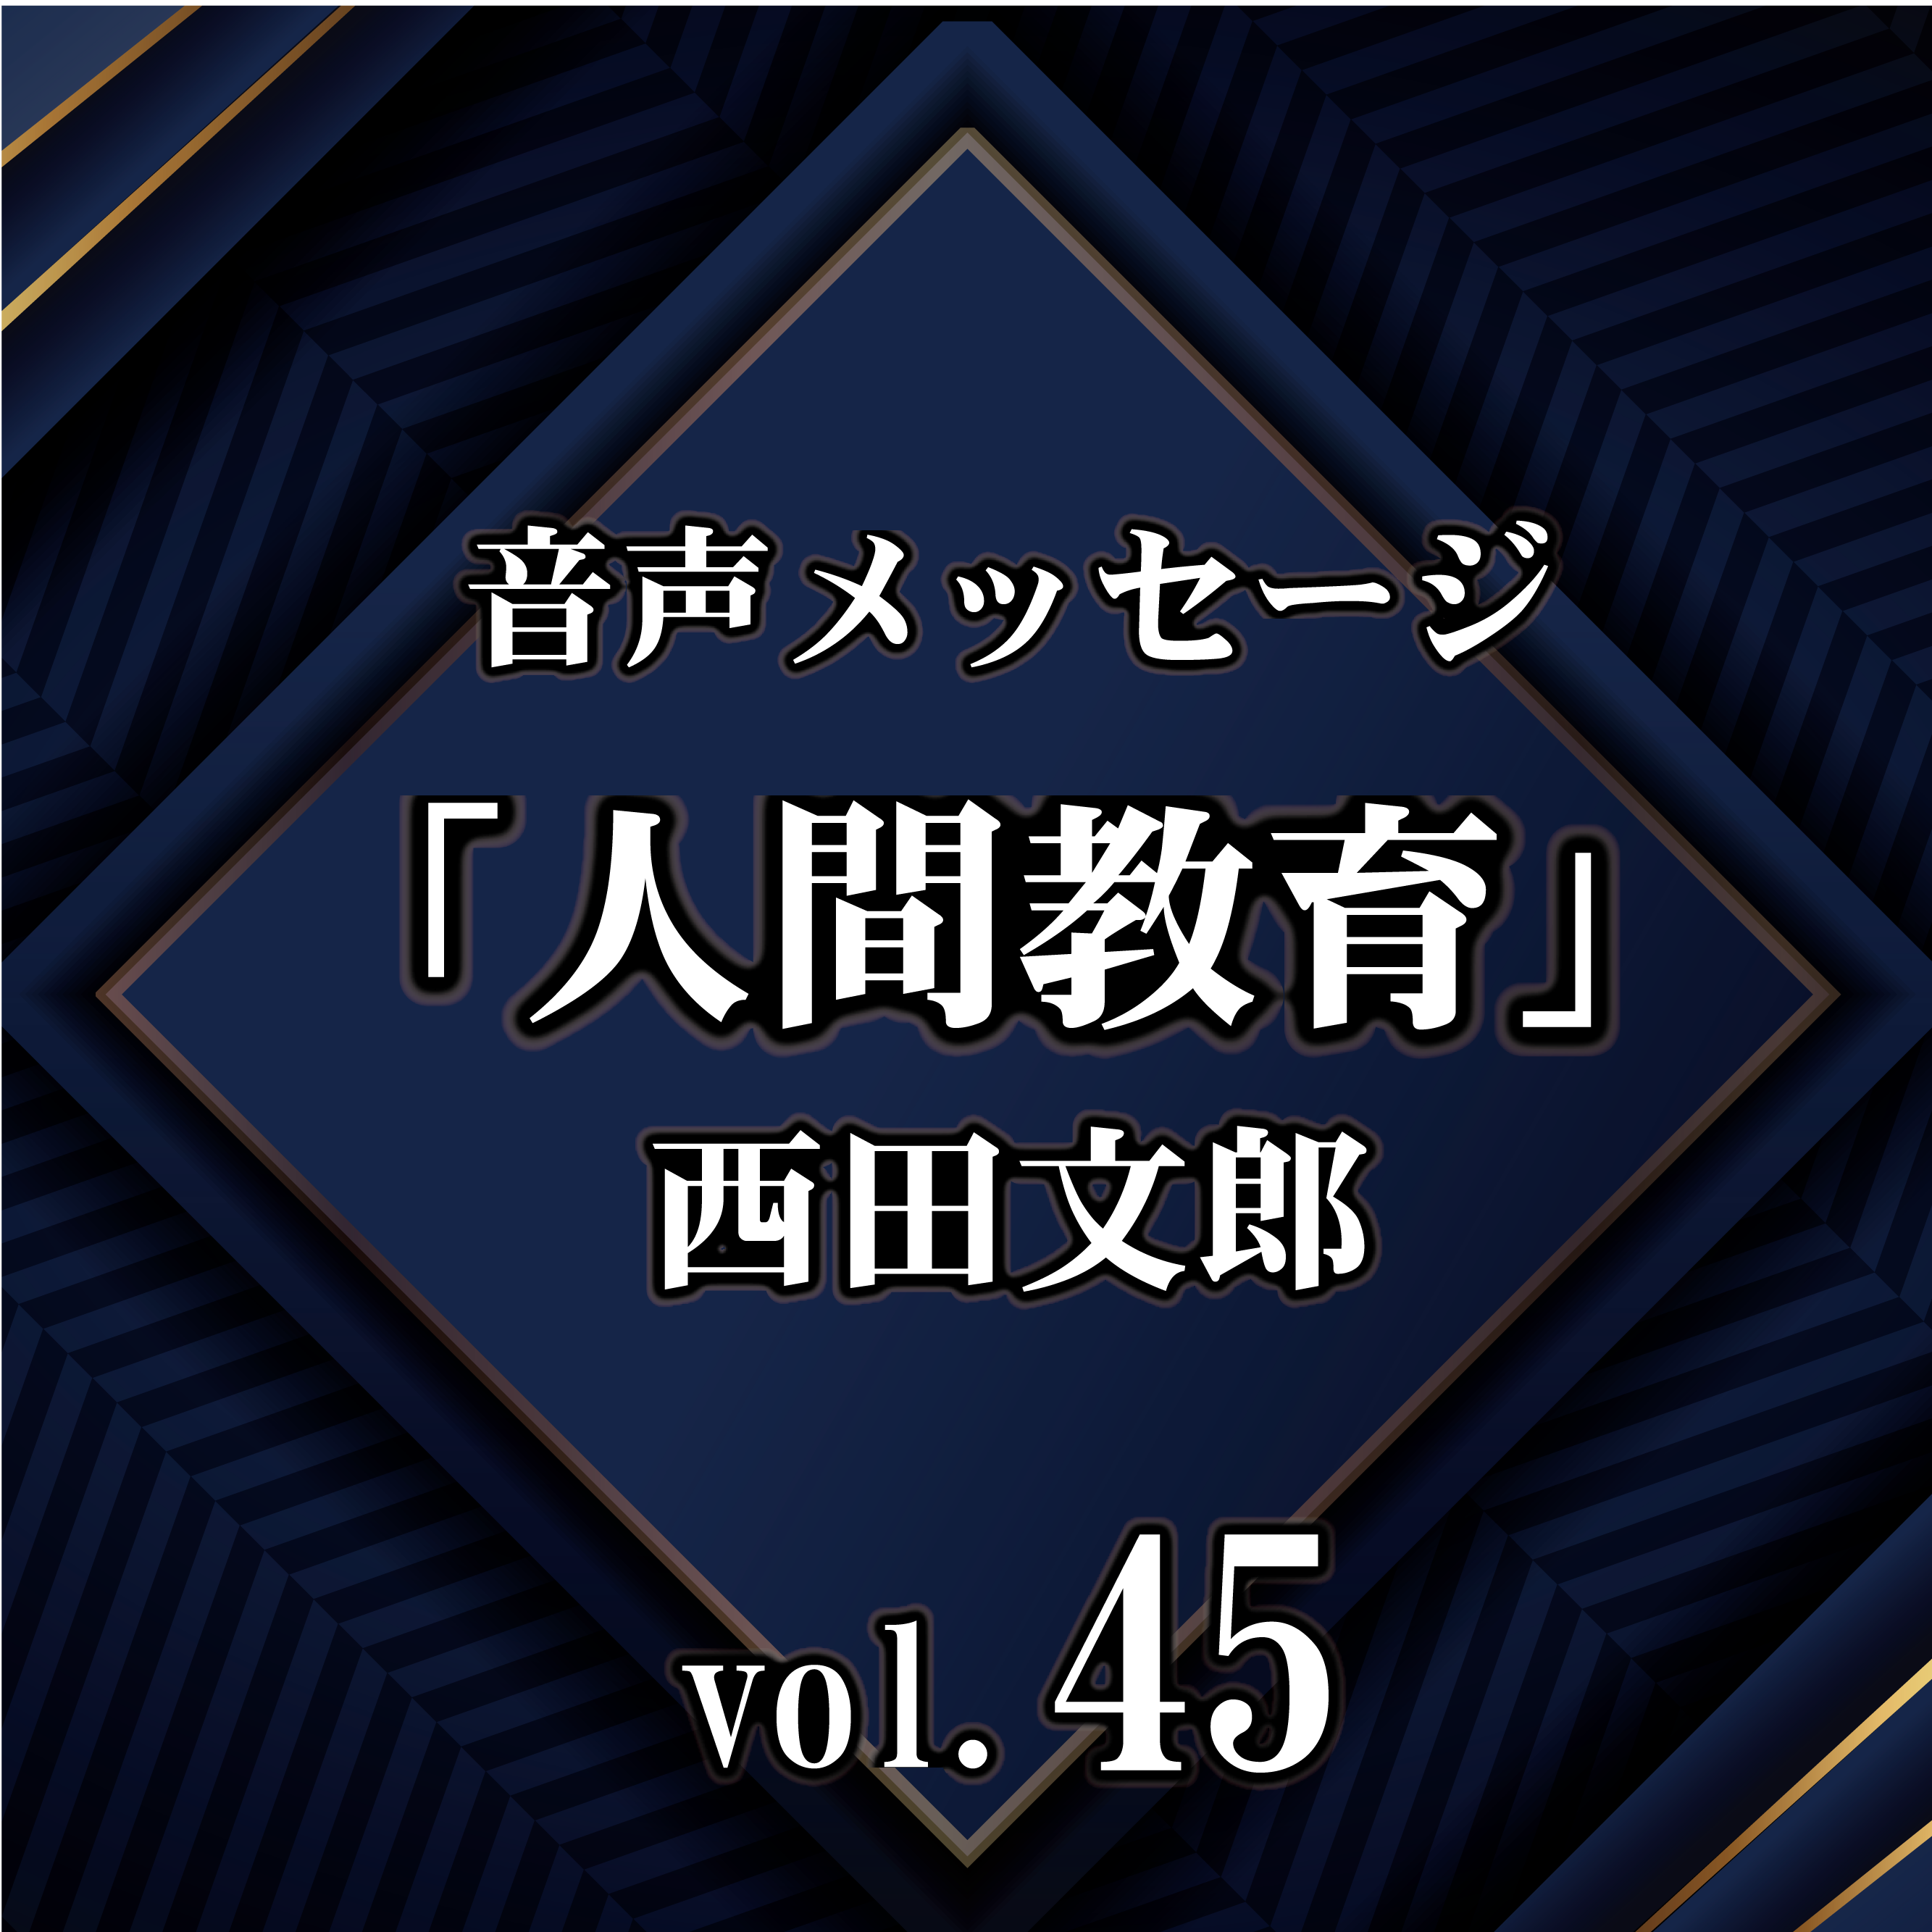 西田文郎 音声メッセージvol.45『人間教育』